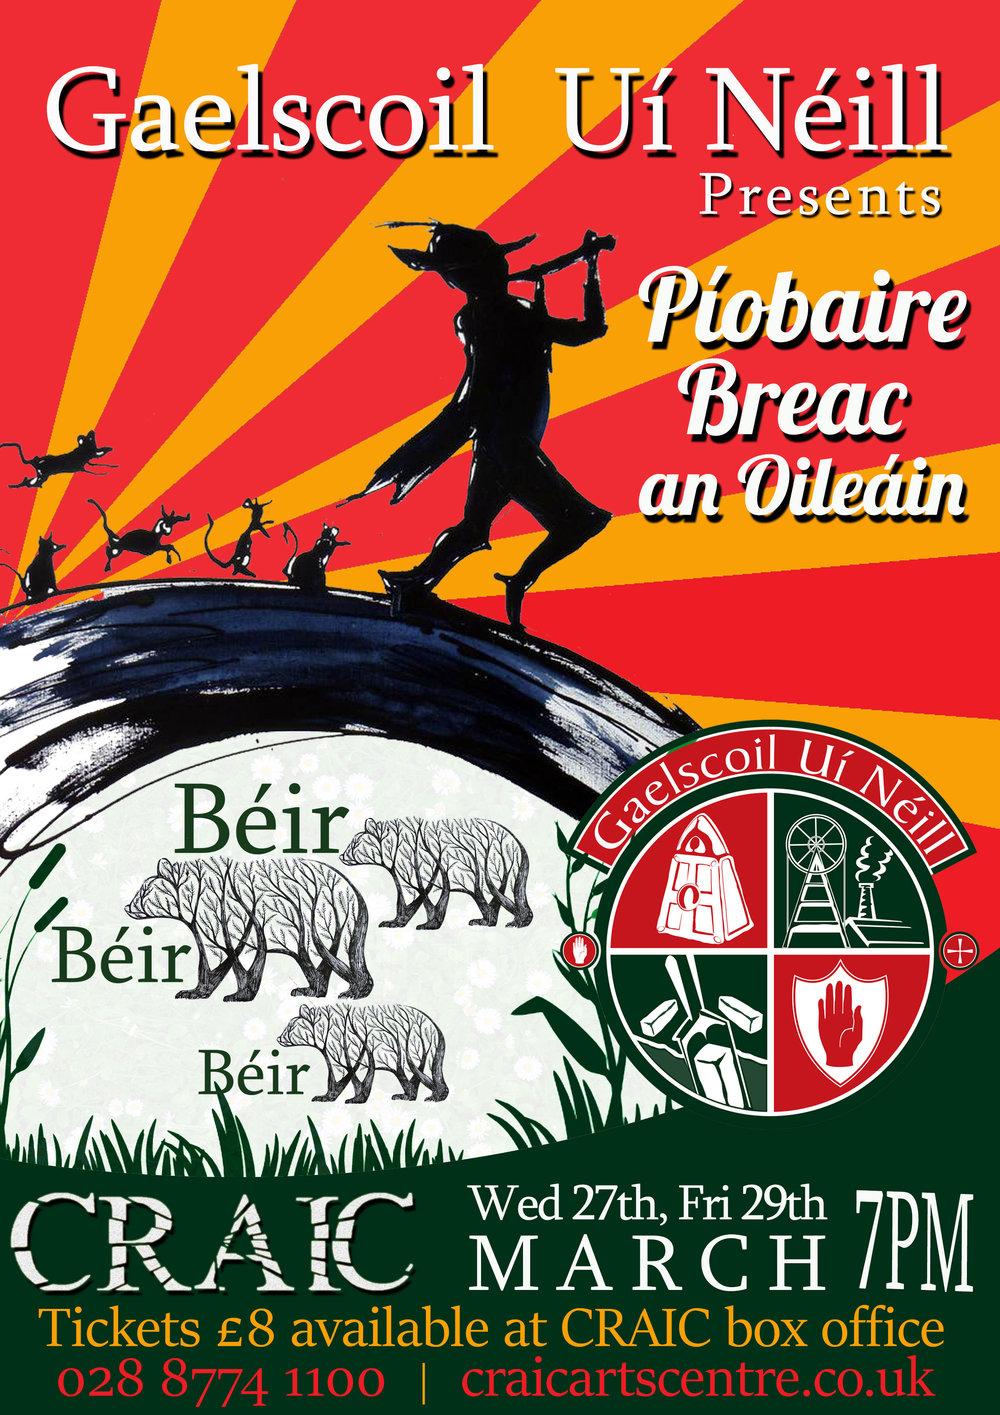 PiobaireBreac_an_Oileáin190214.JPG